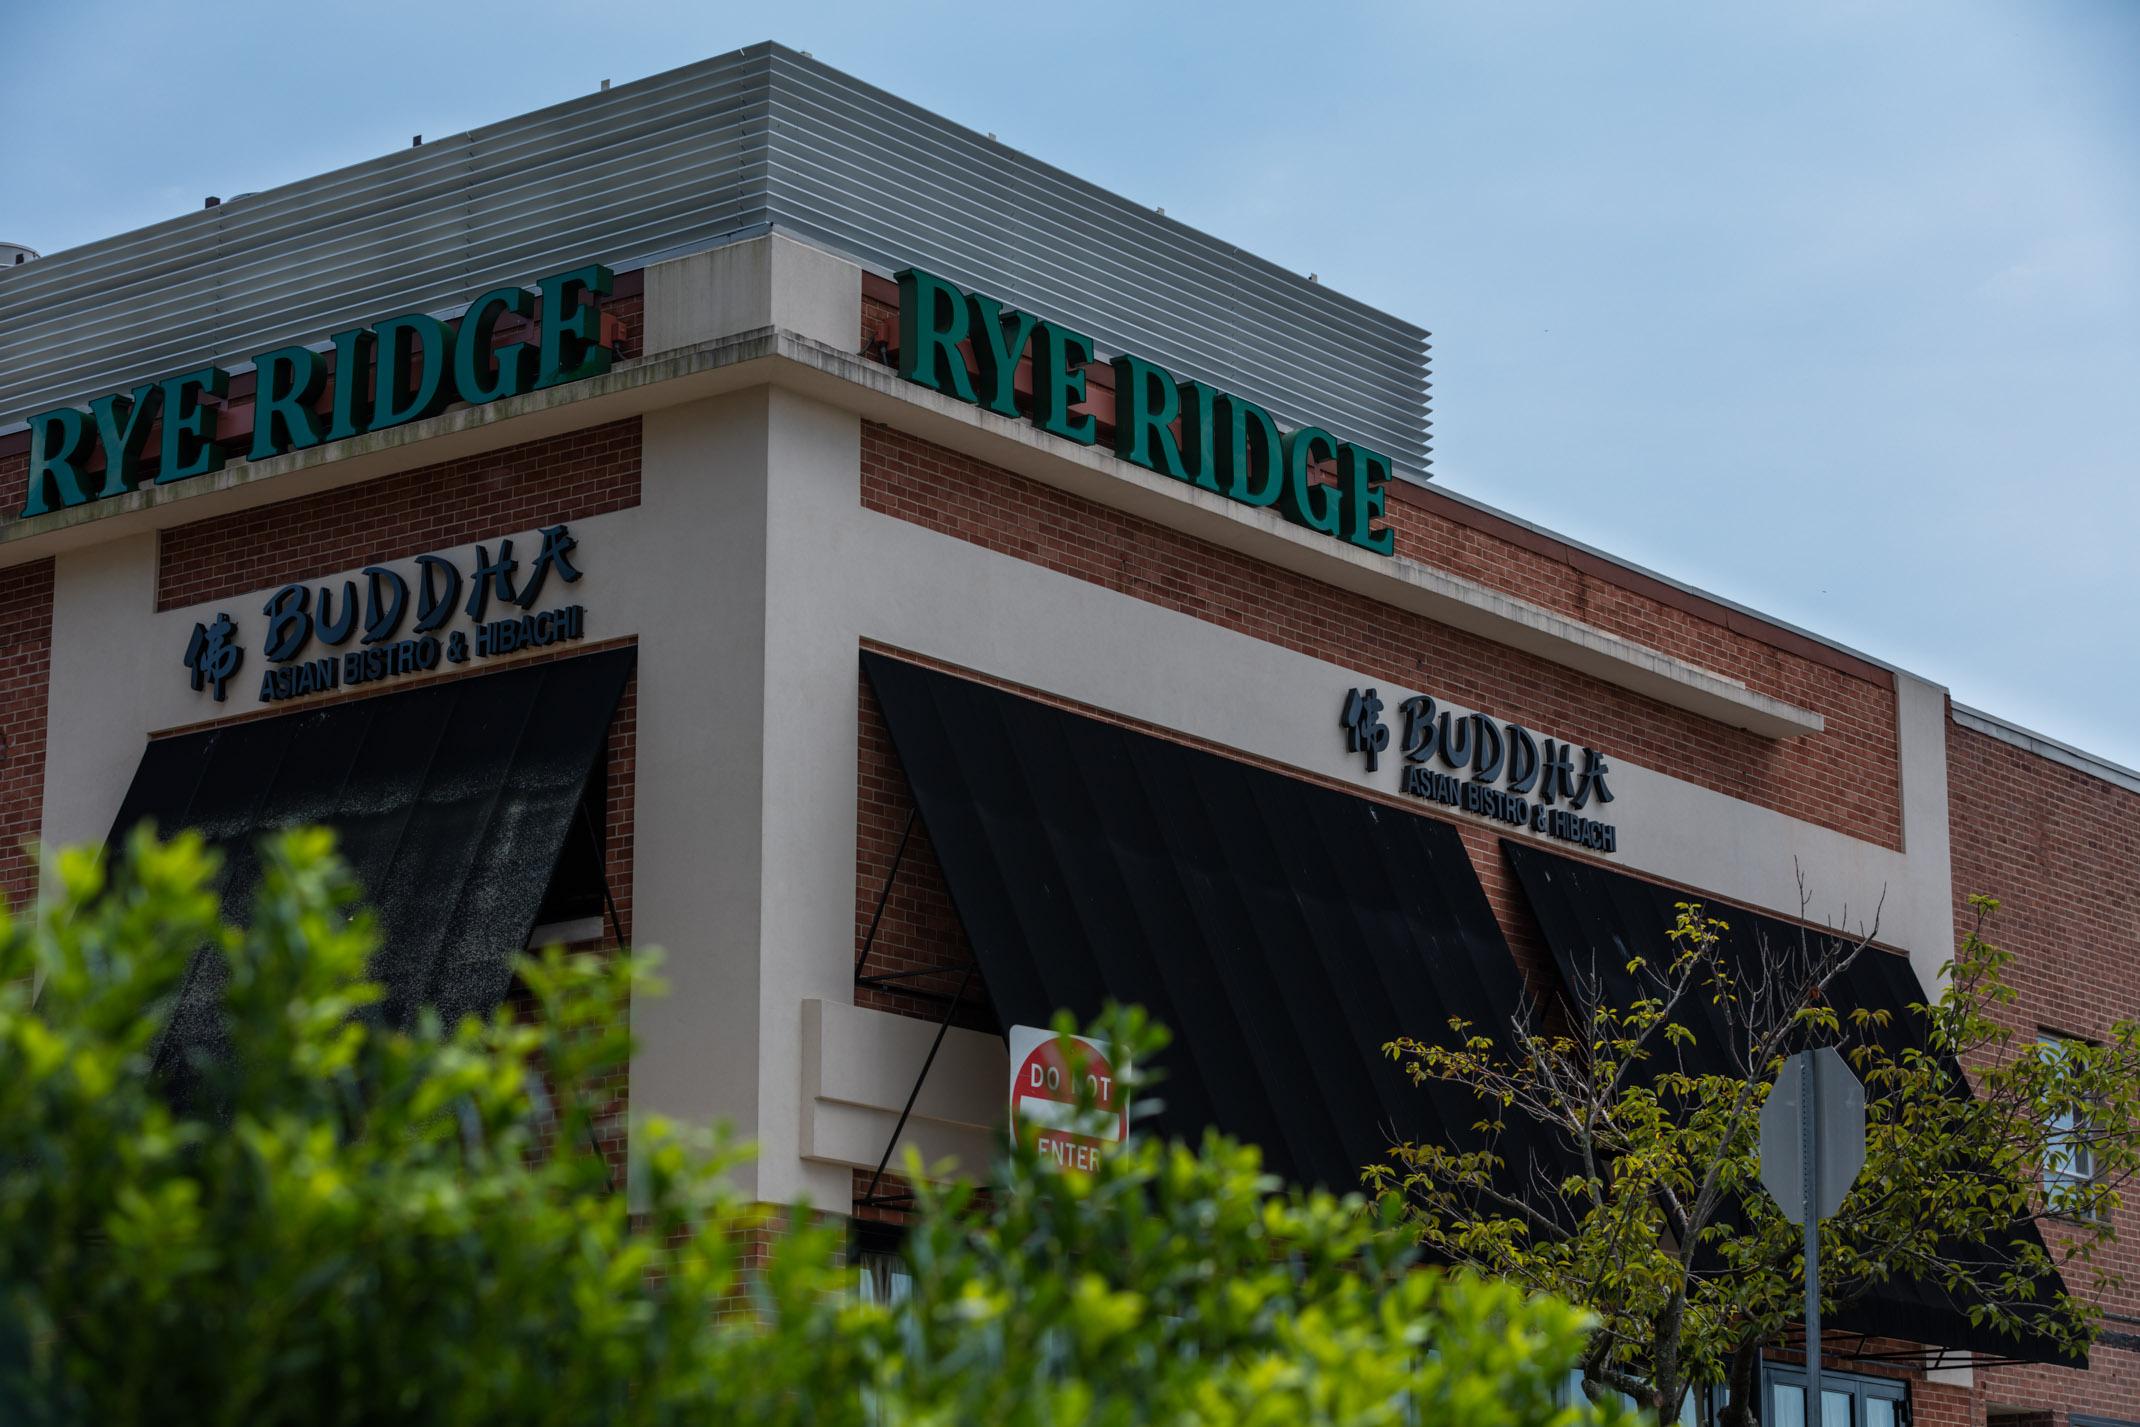 Rye Ridge Shopping Center